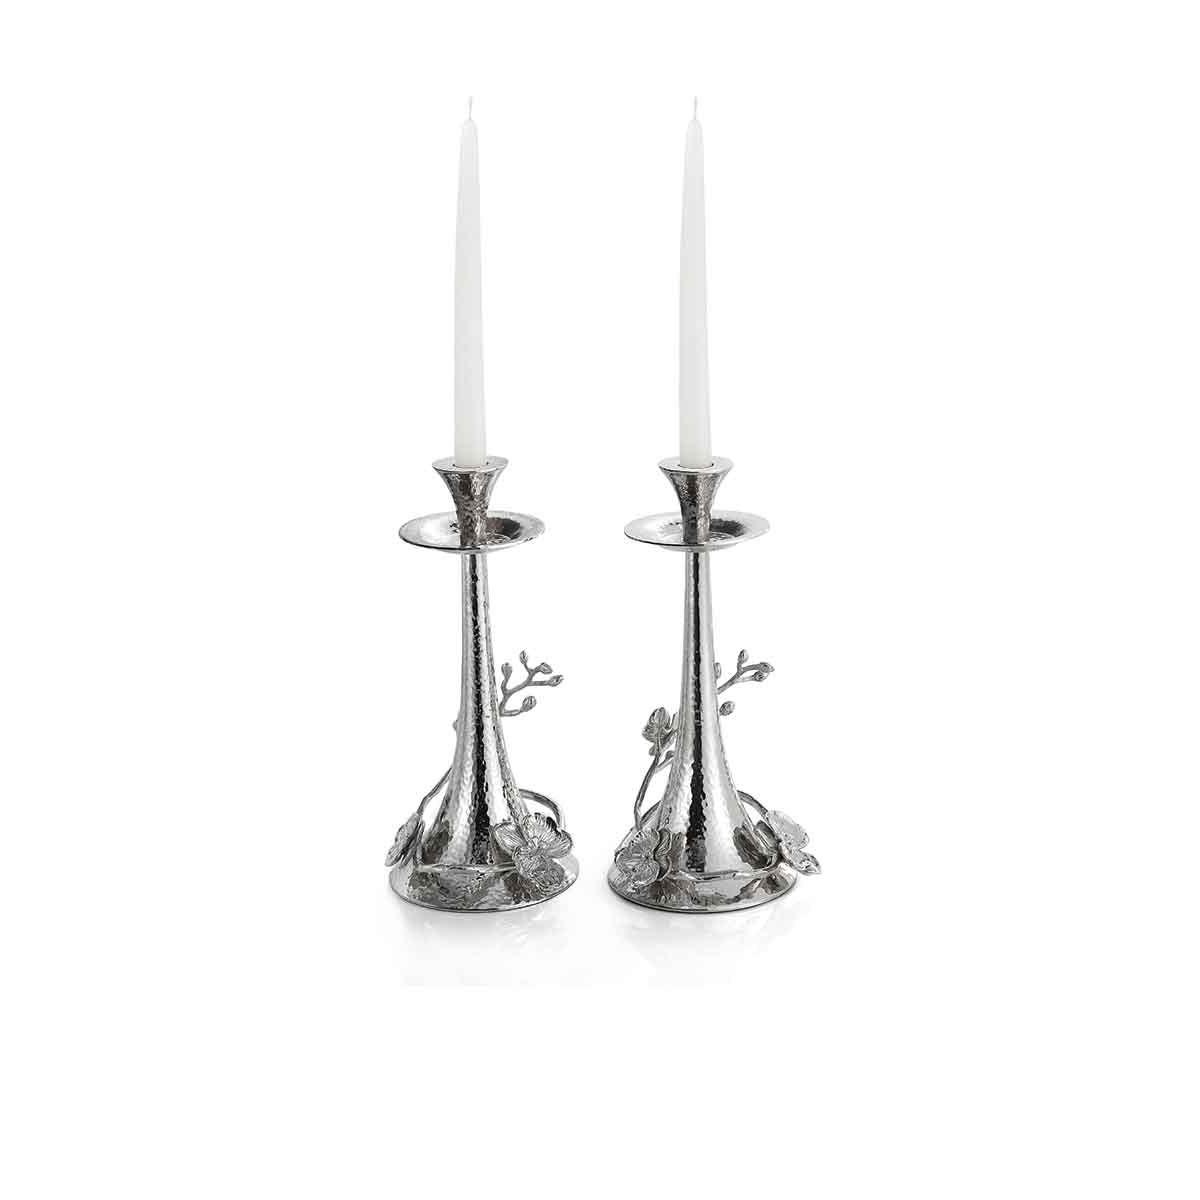 Michael Aram White Orchid Candleholder, Pair